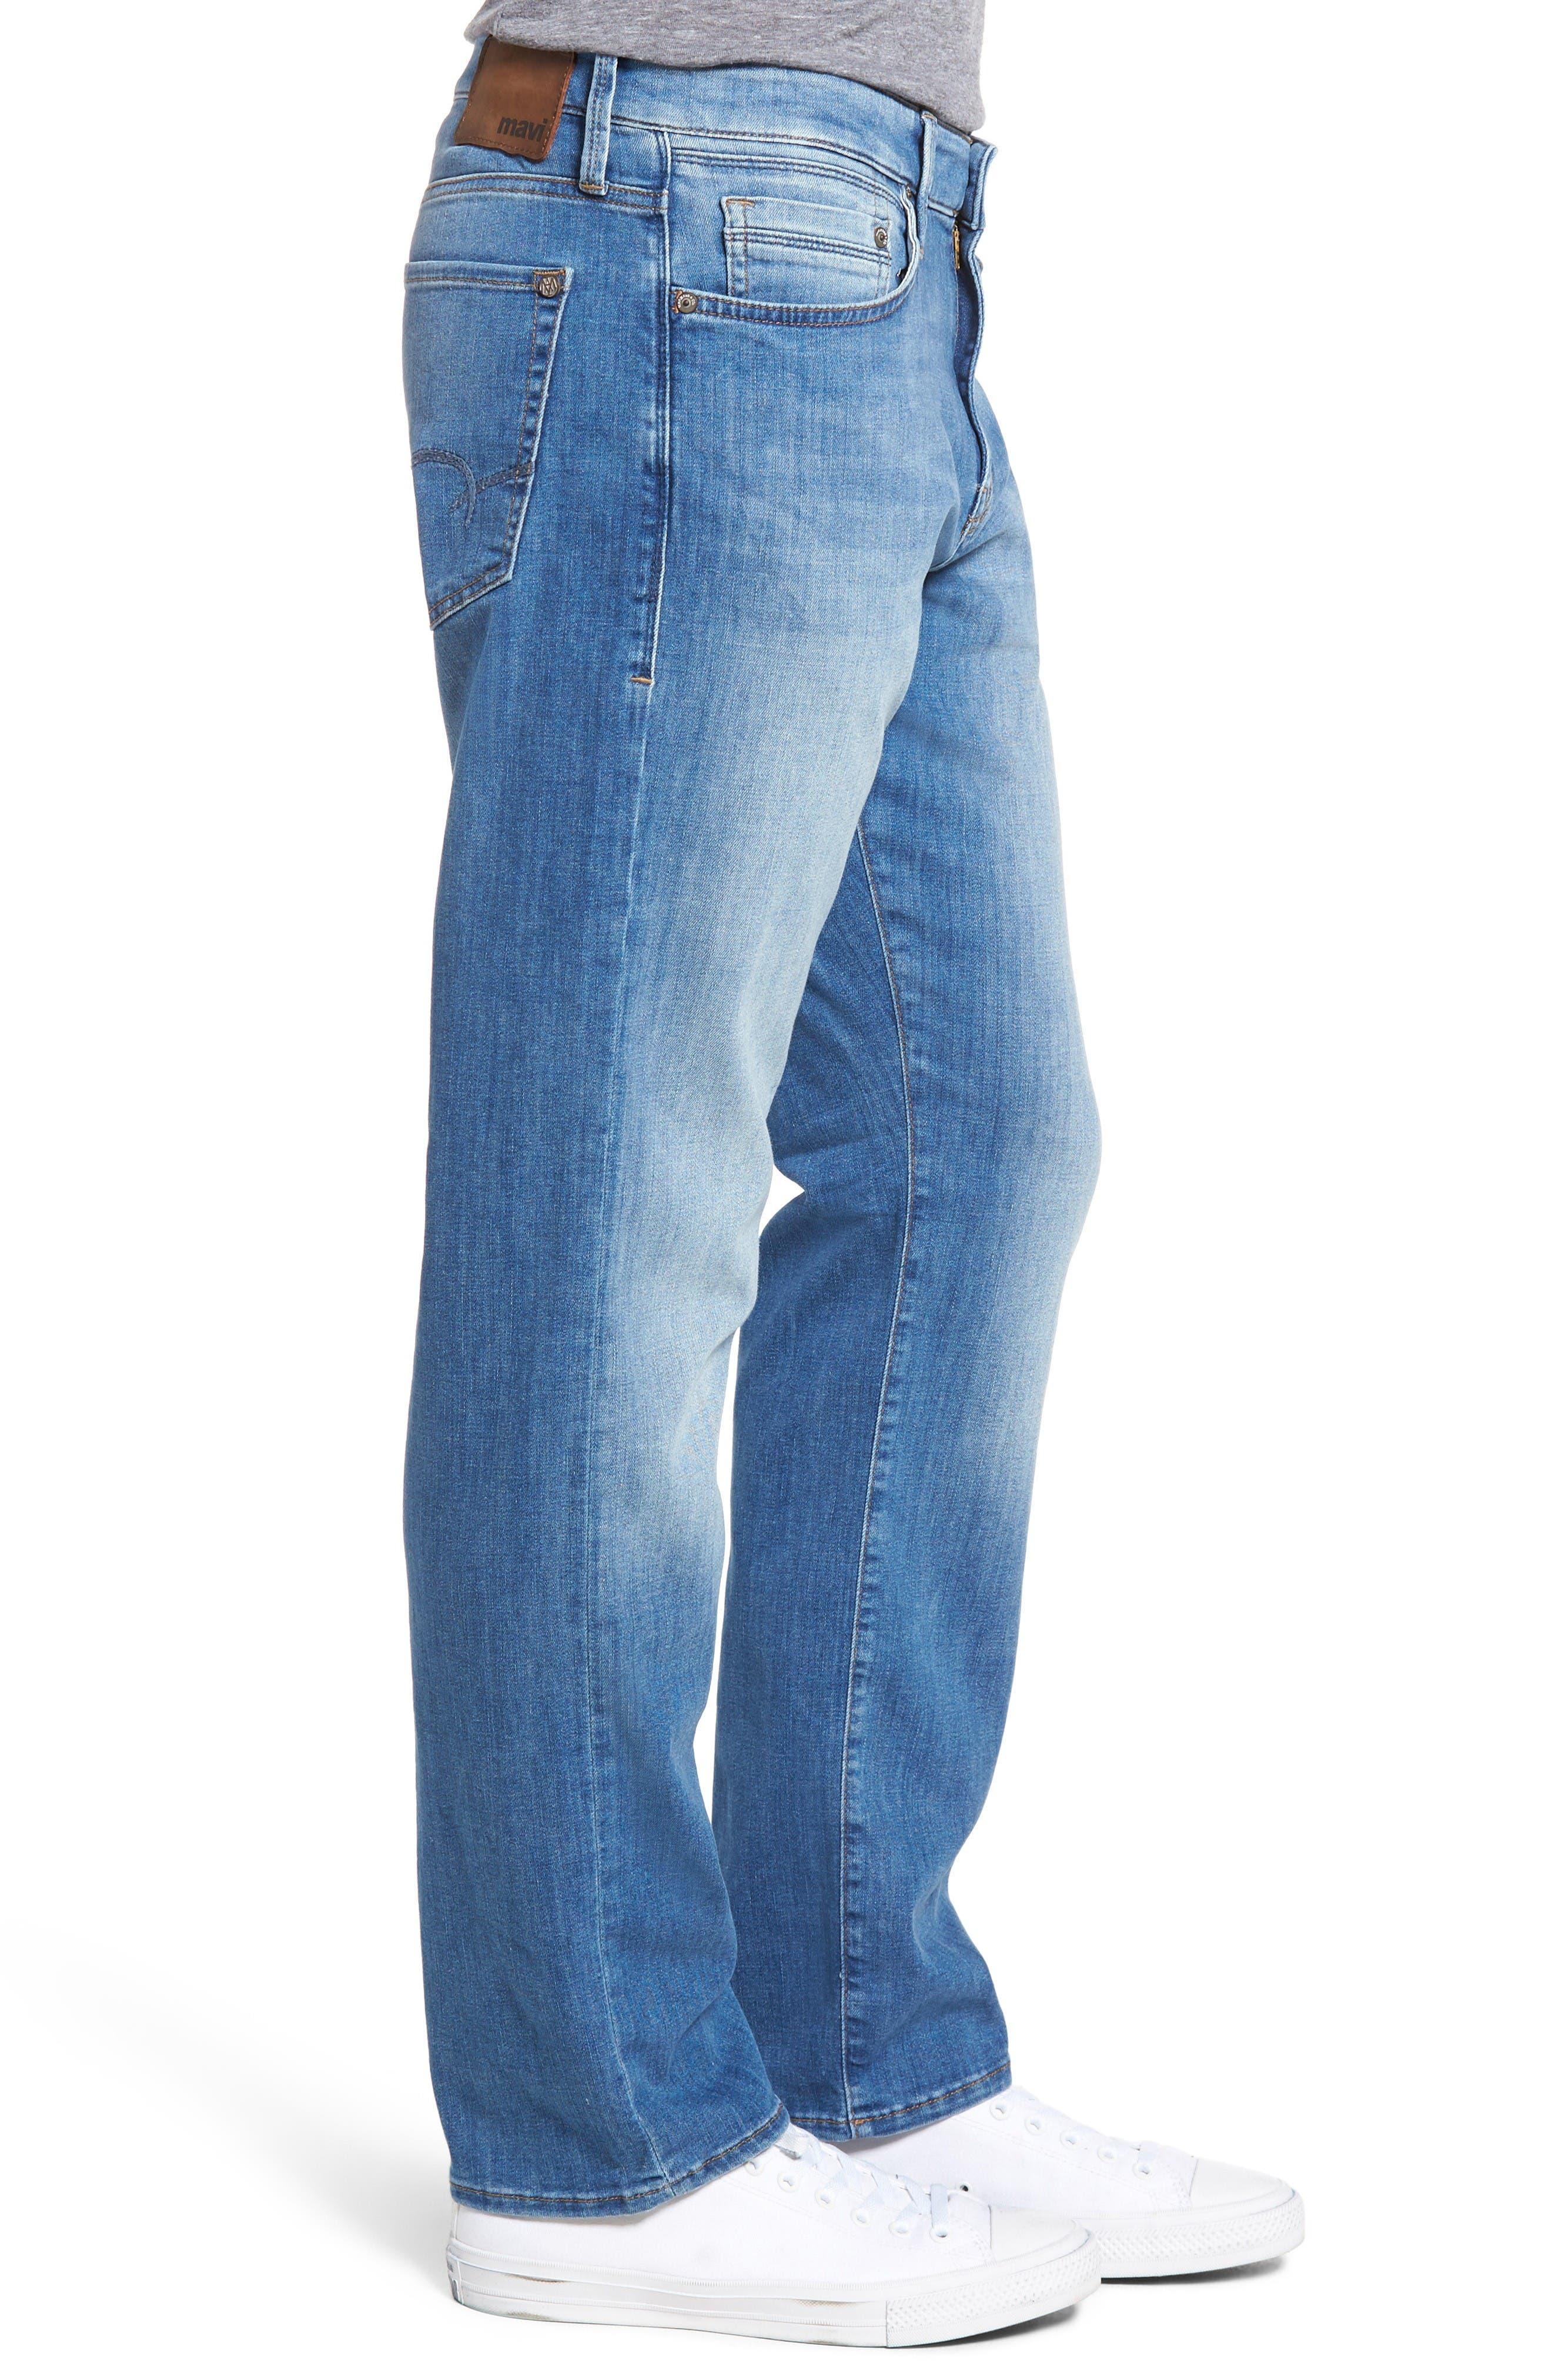 Myles Straight Leg Jeans,                             Alternate thumbnail 3, color,                             Mid Blue Portland